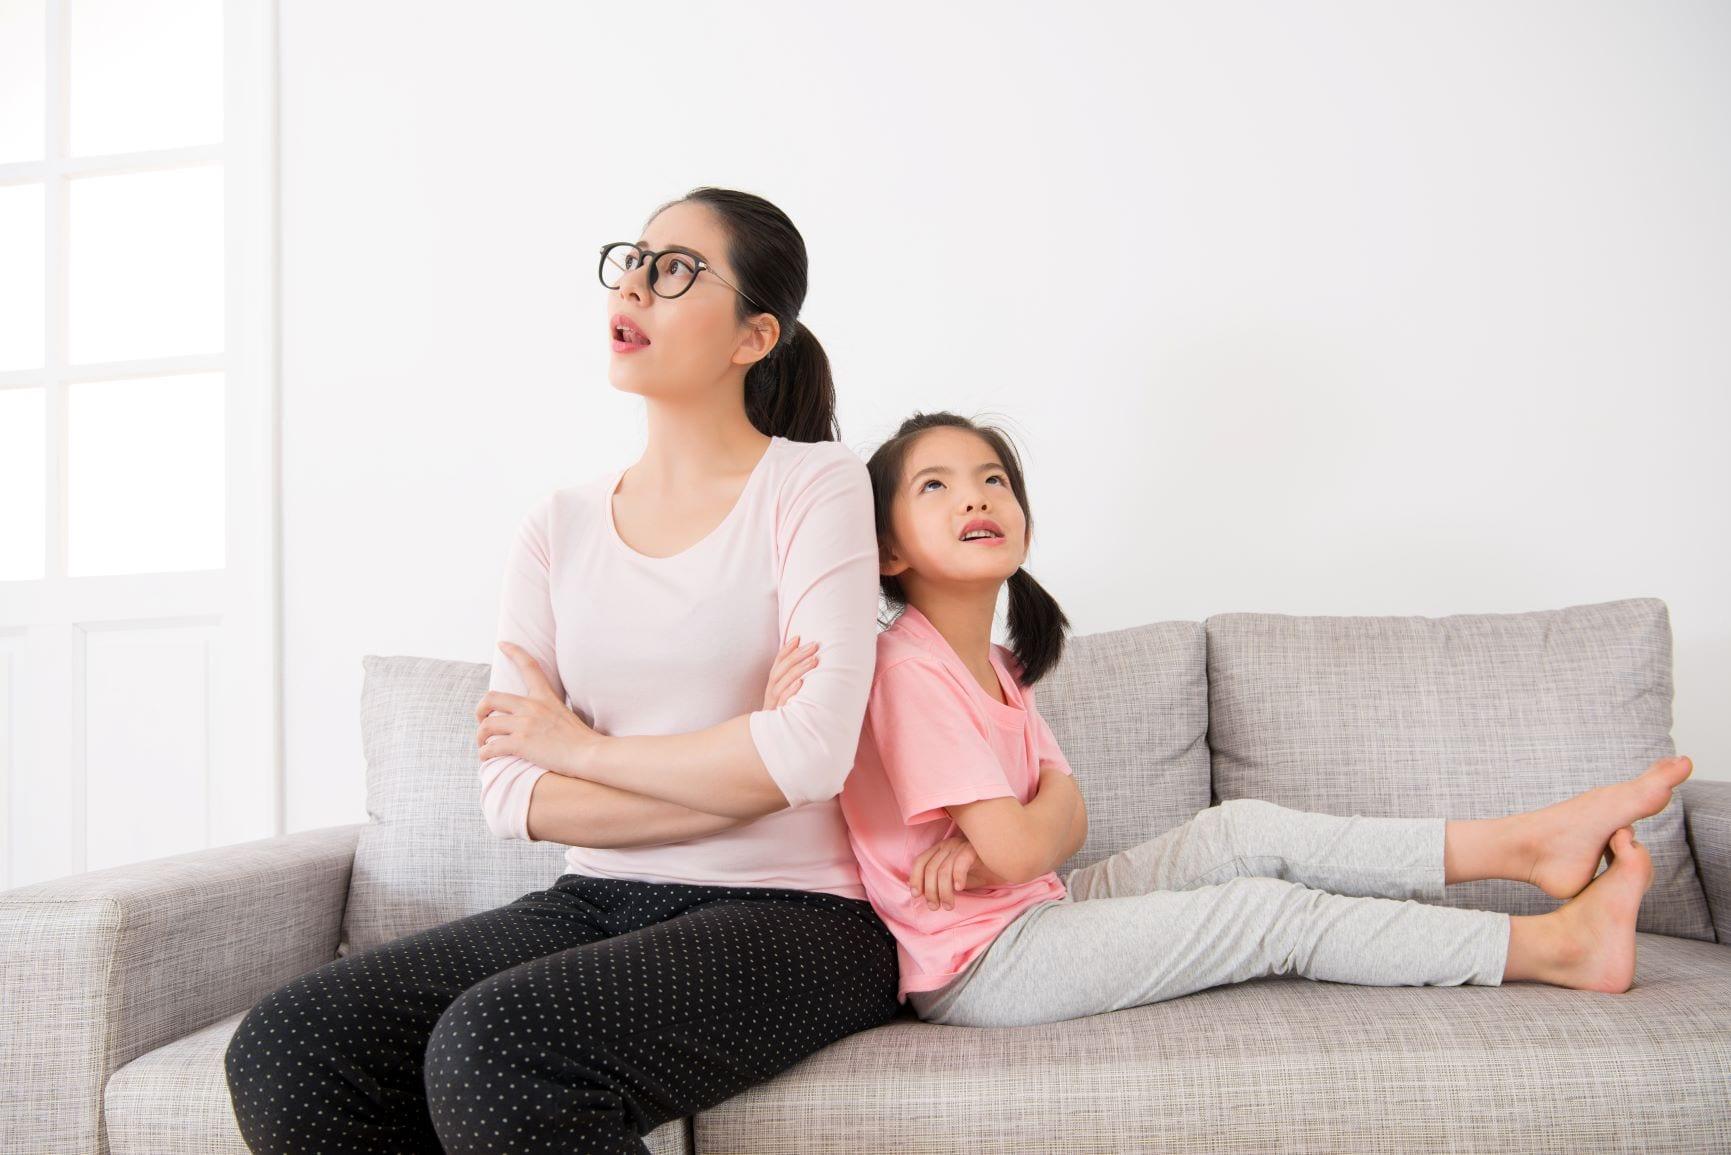 culpa famílias